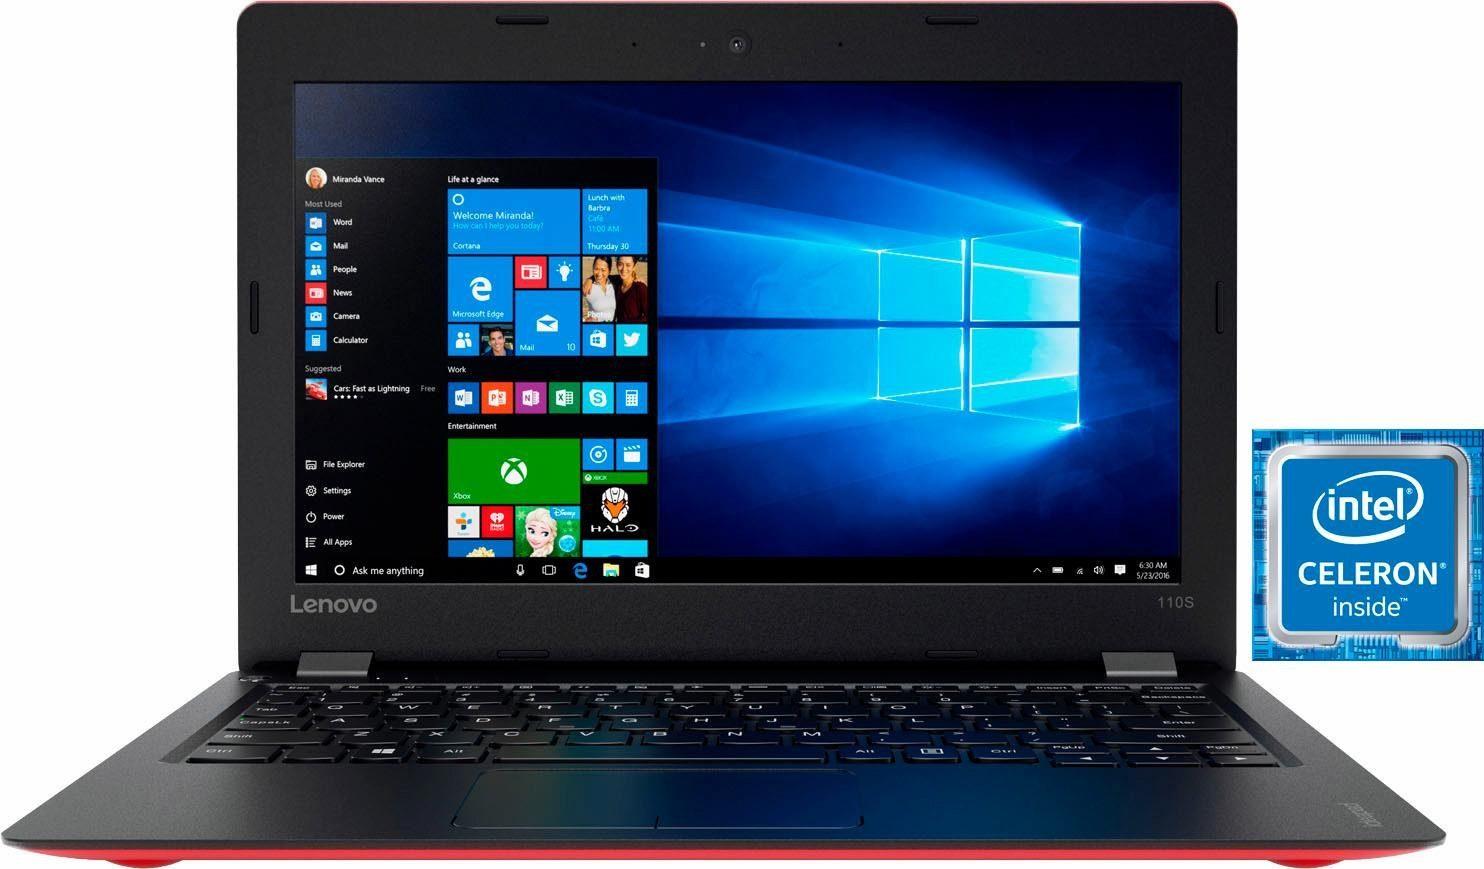 Lenovo Ideapad 110S-11IBR Notebook, Intel® Celeron™, 29,5 cm (11,6 Zoll), 32 GB Speicher